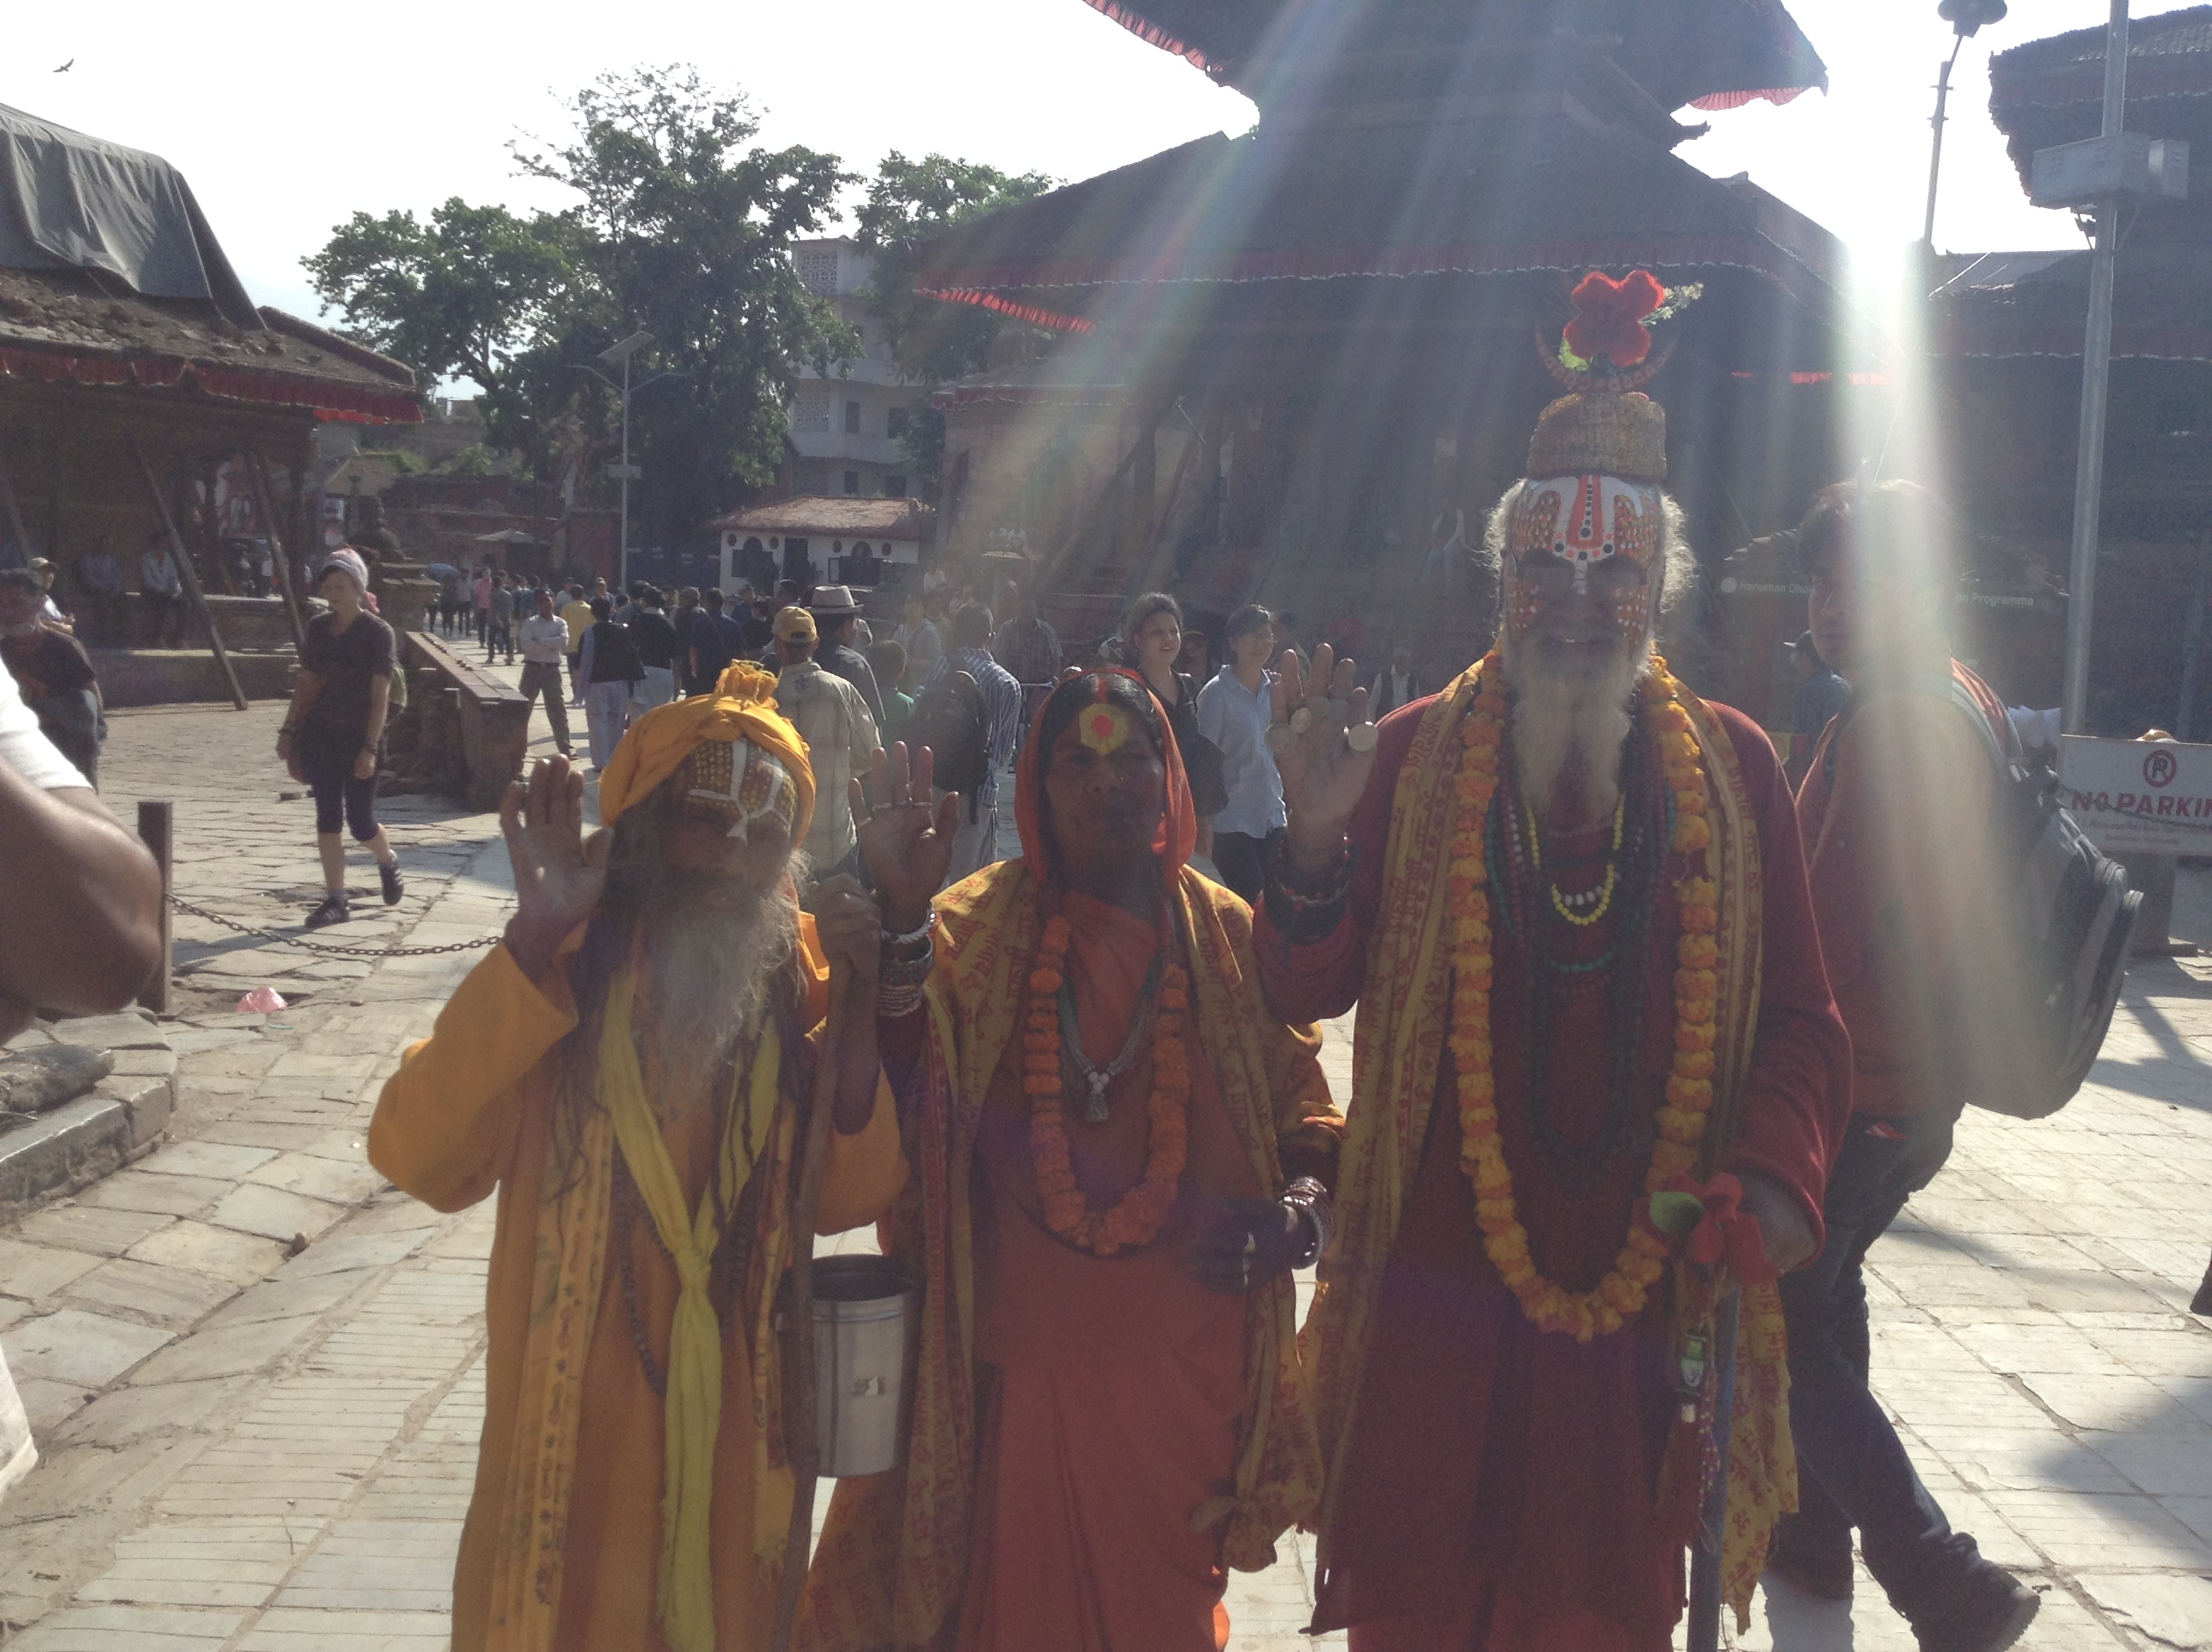 Nepal, Nepal earthquake, holy men, travel, travel to Nepal, Nepal travel